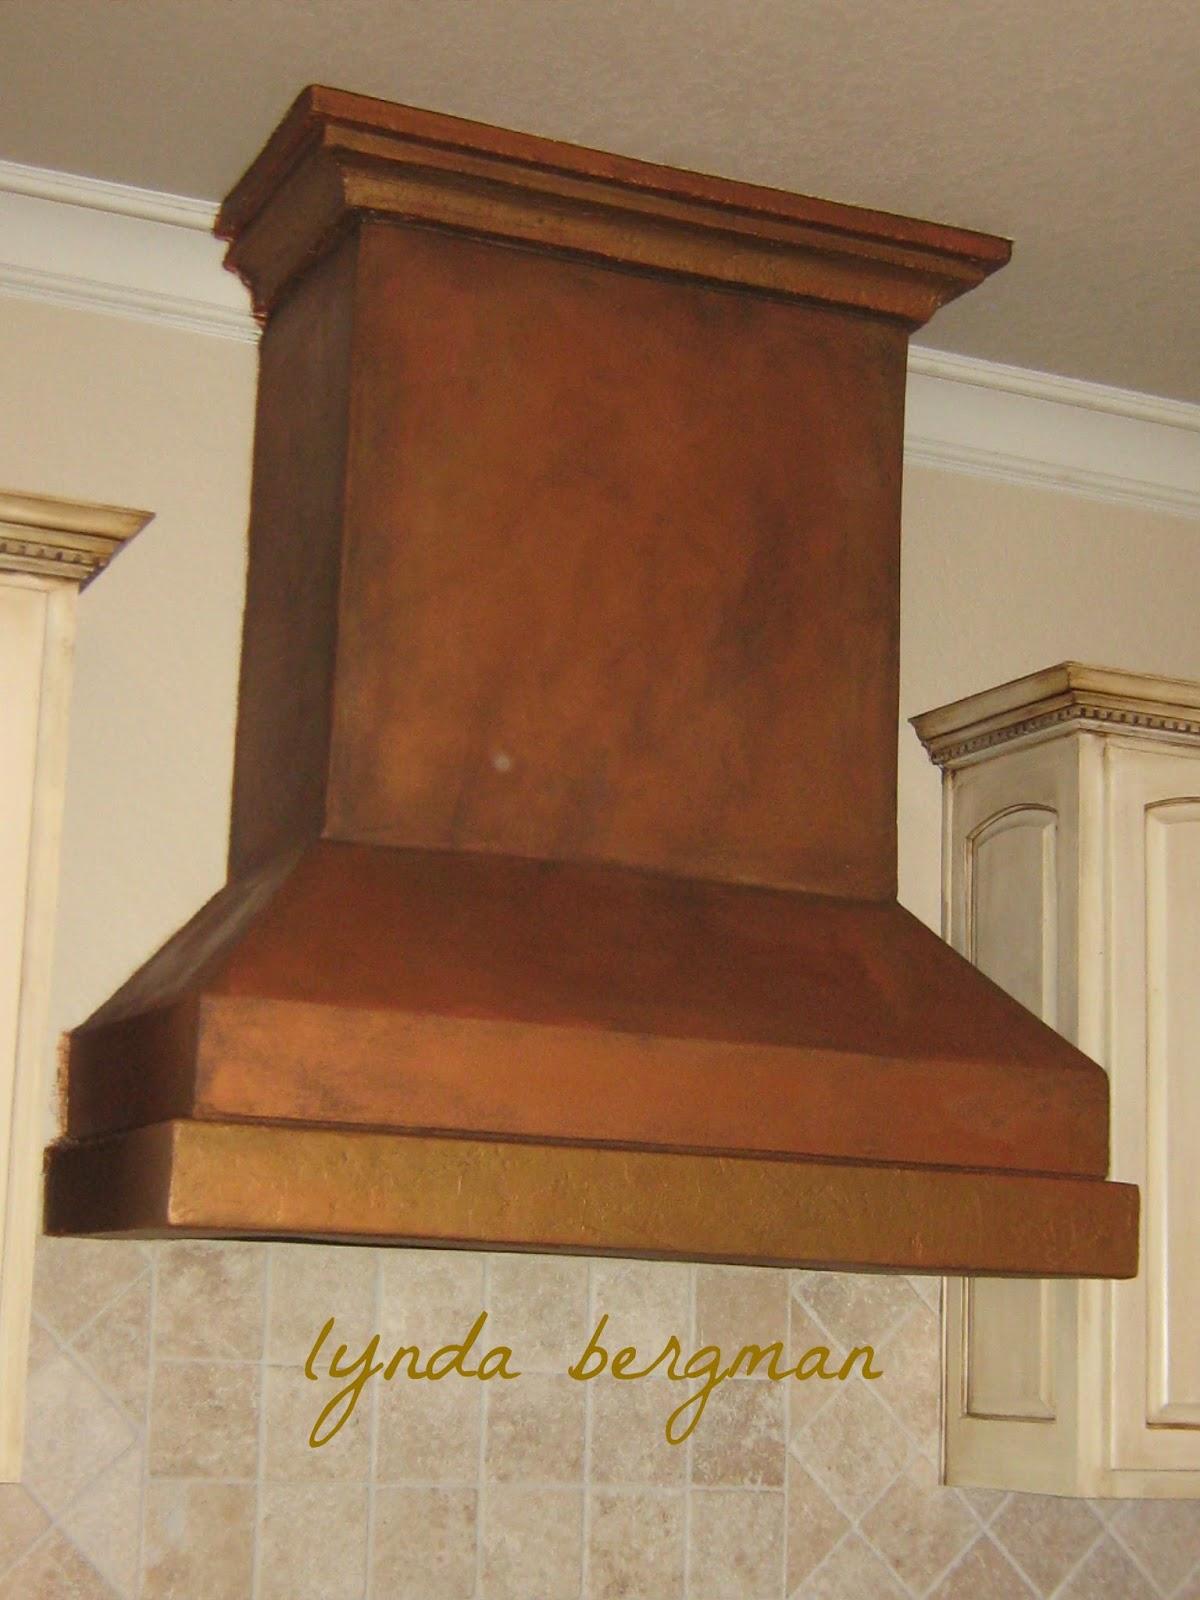 Lynda Bergman Decorative Artisan Christa S Newly Painted